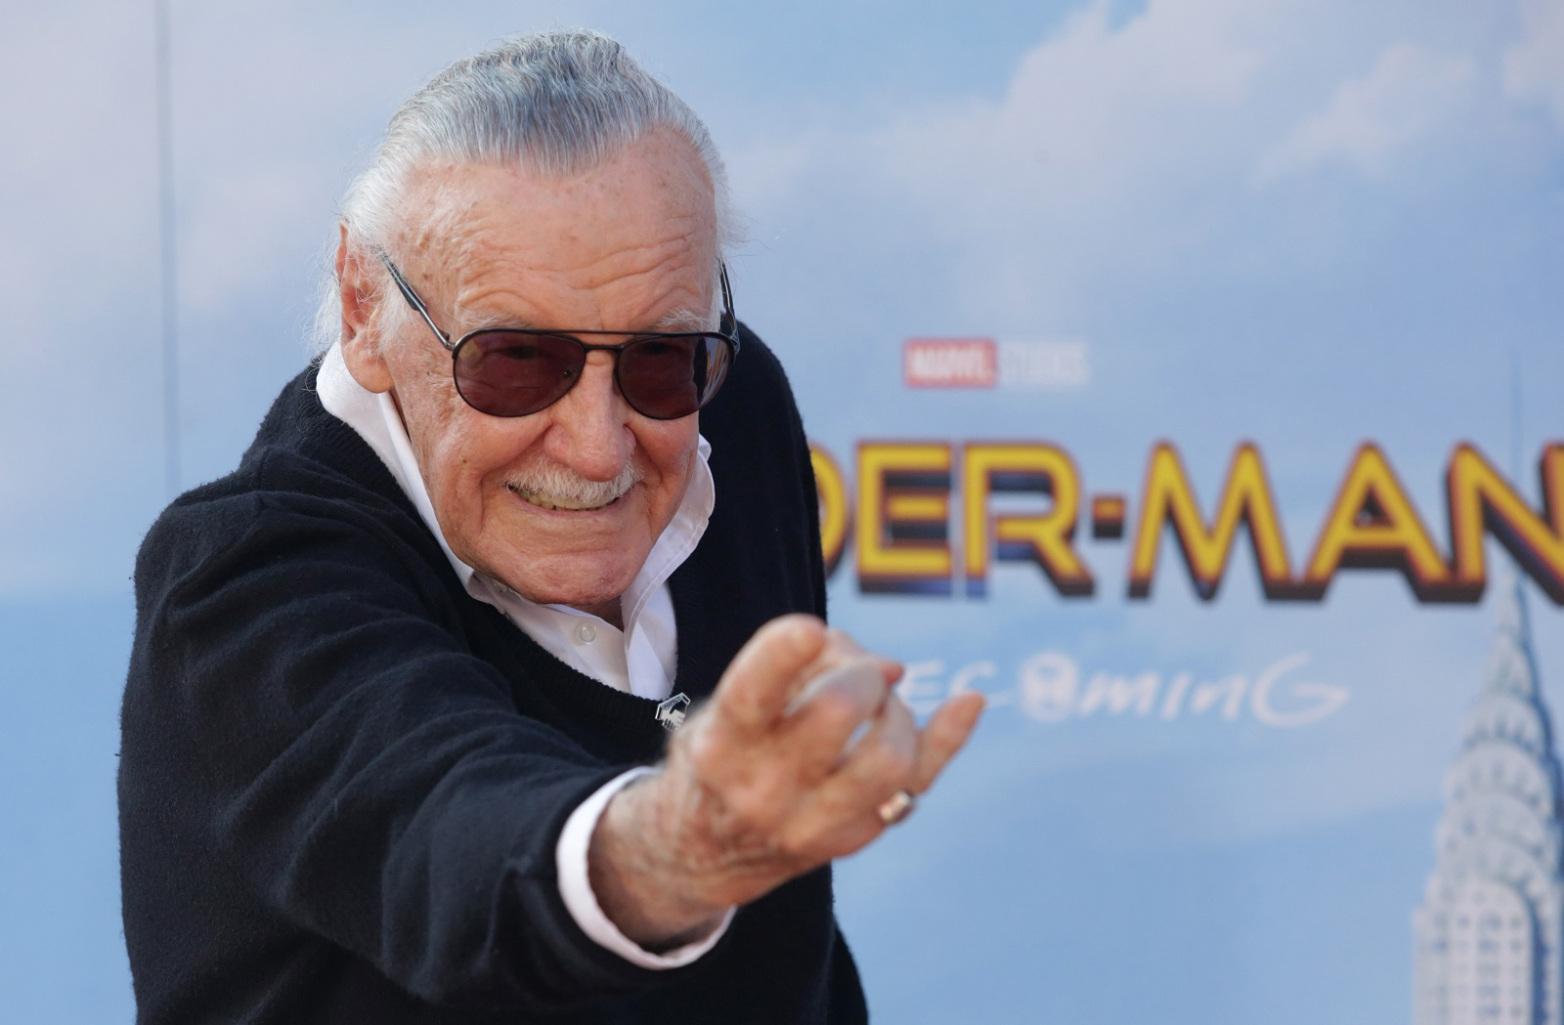 Stan Lee cameo Avengers- Endgame